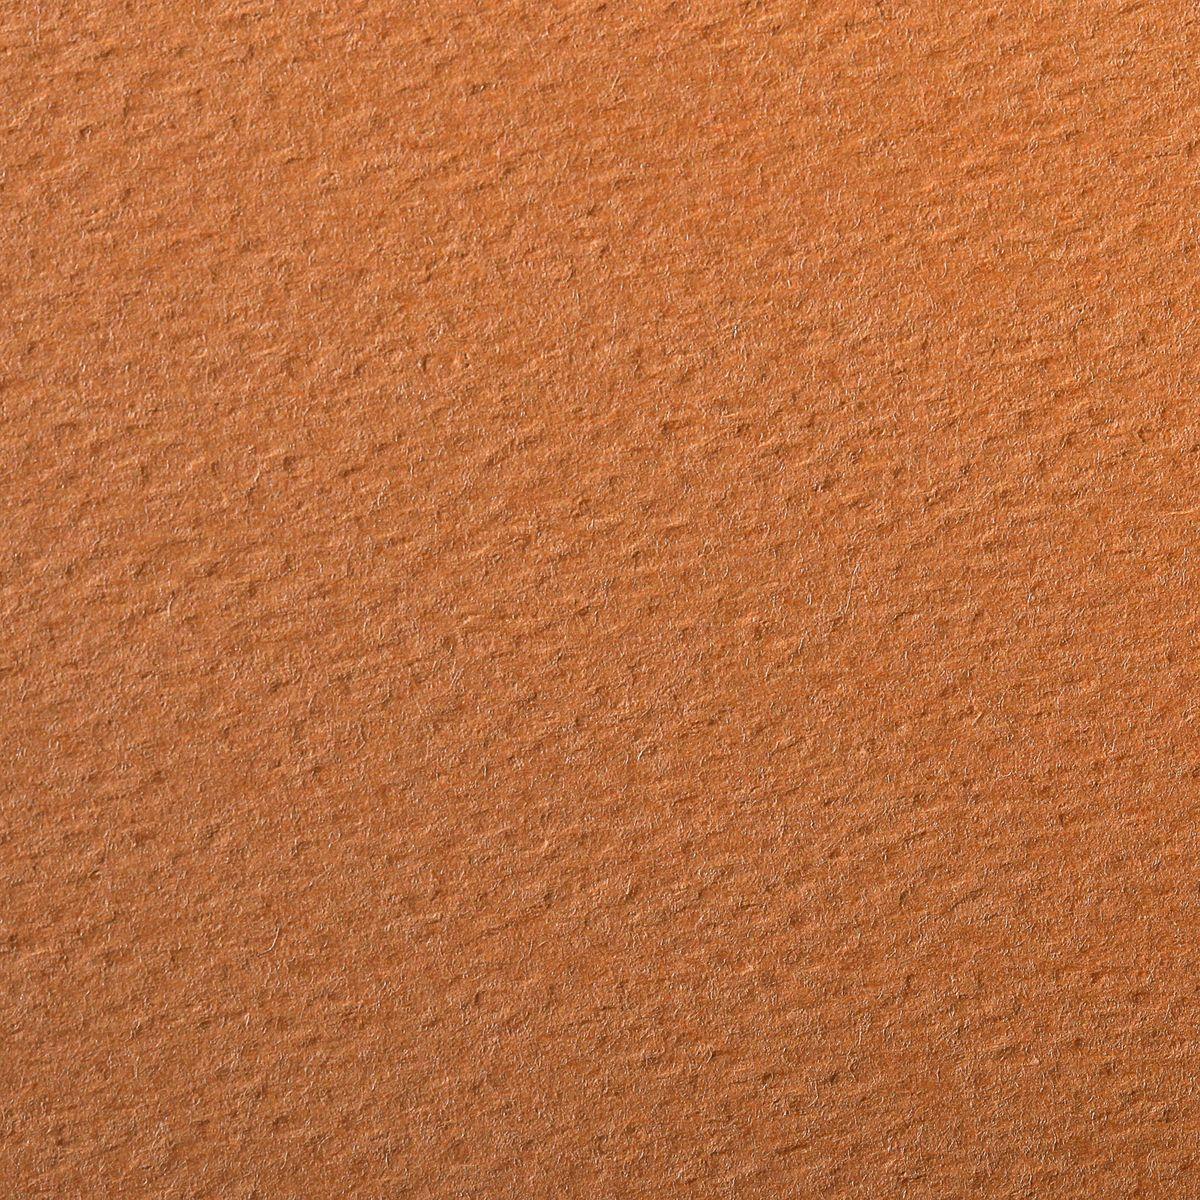 Бумага Clairefontaine Etival Color, формат A4, цвет обложки: темно-оранжевый, 25 листов97775318Бумага ETIVAL COLOR (А4, 160г, 25л) Ржавчина 93889С